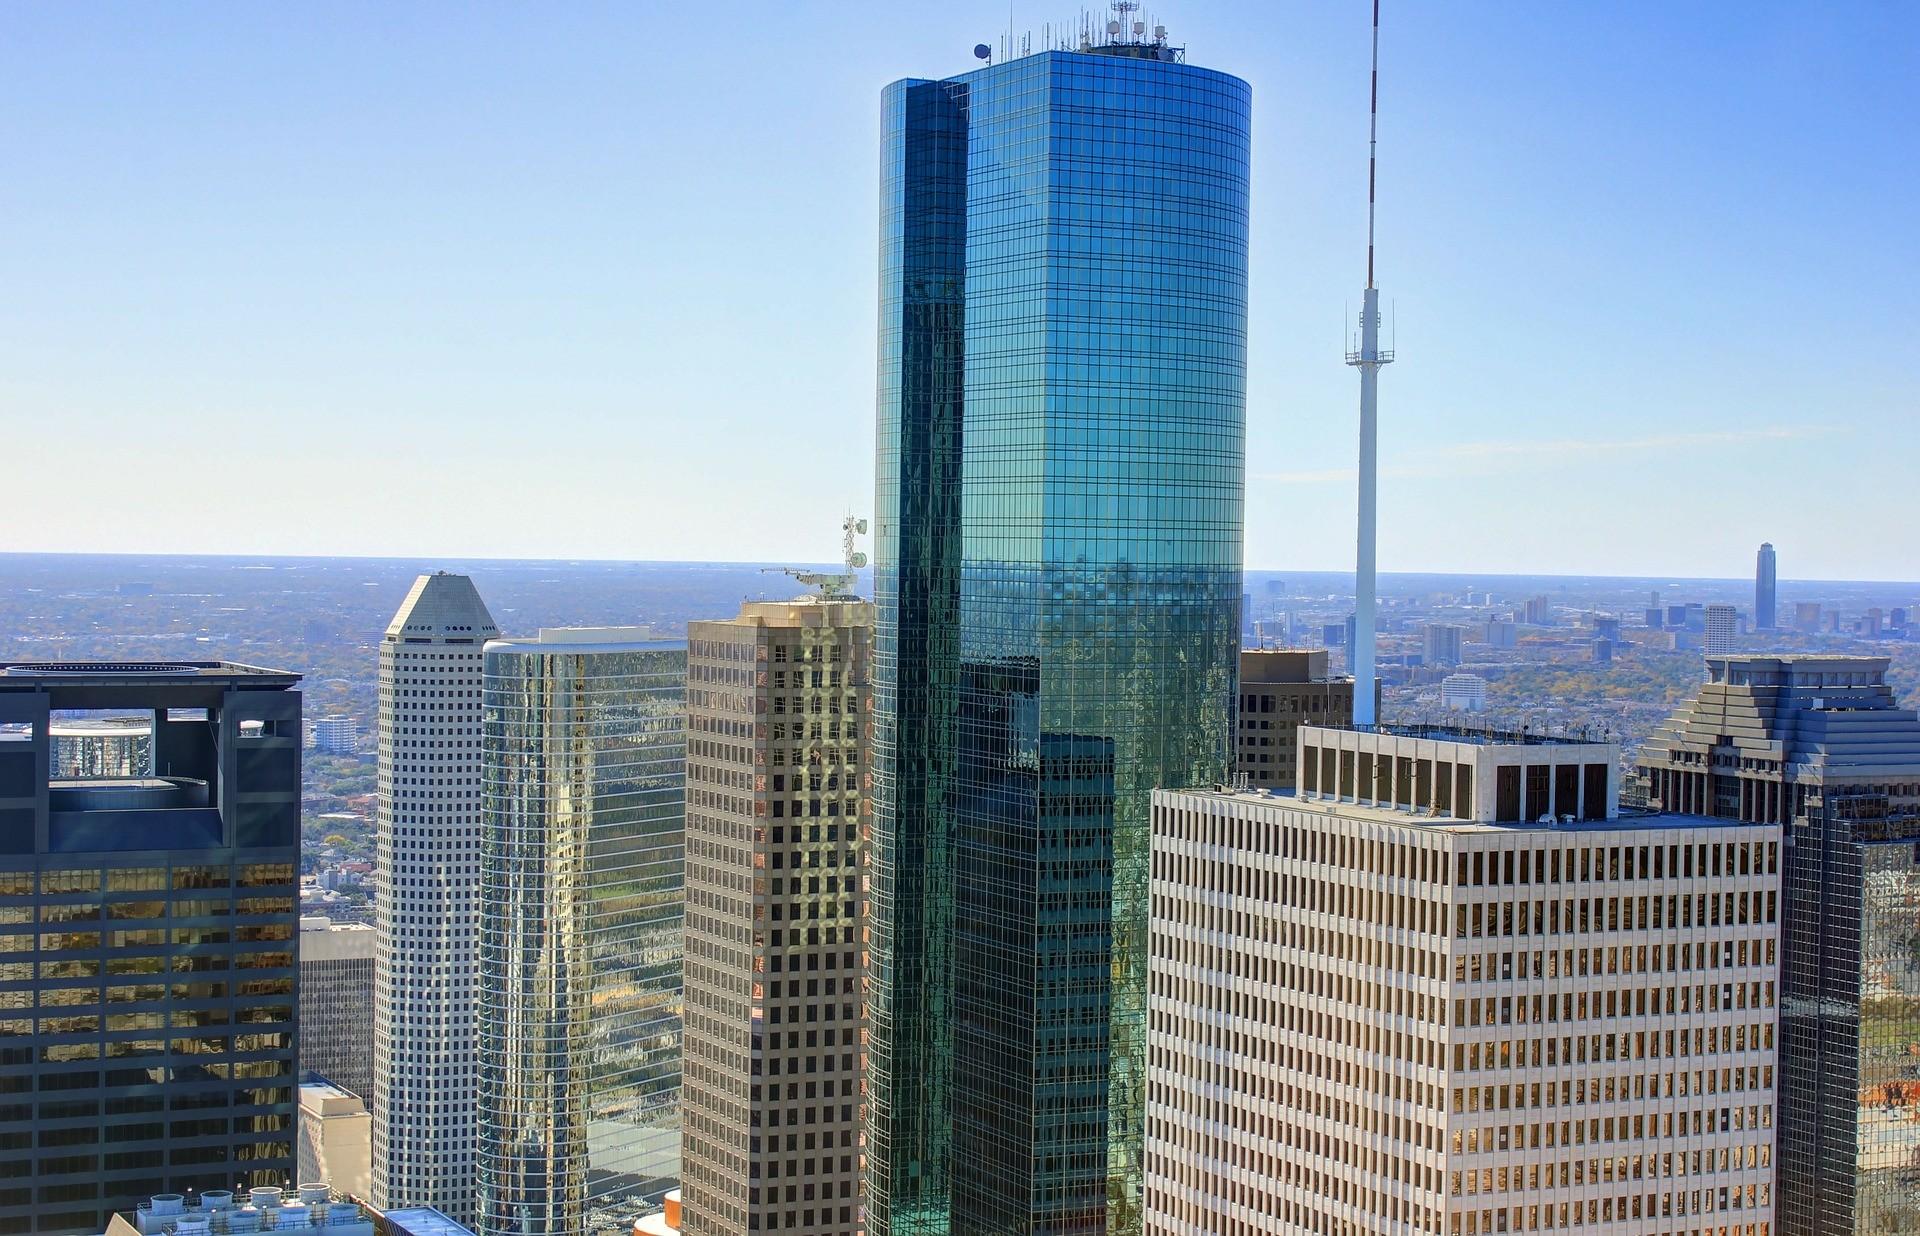 University of Houston Texas Gulf Coast SBDC Network | LinkedIn